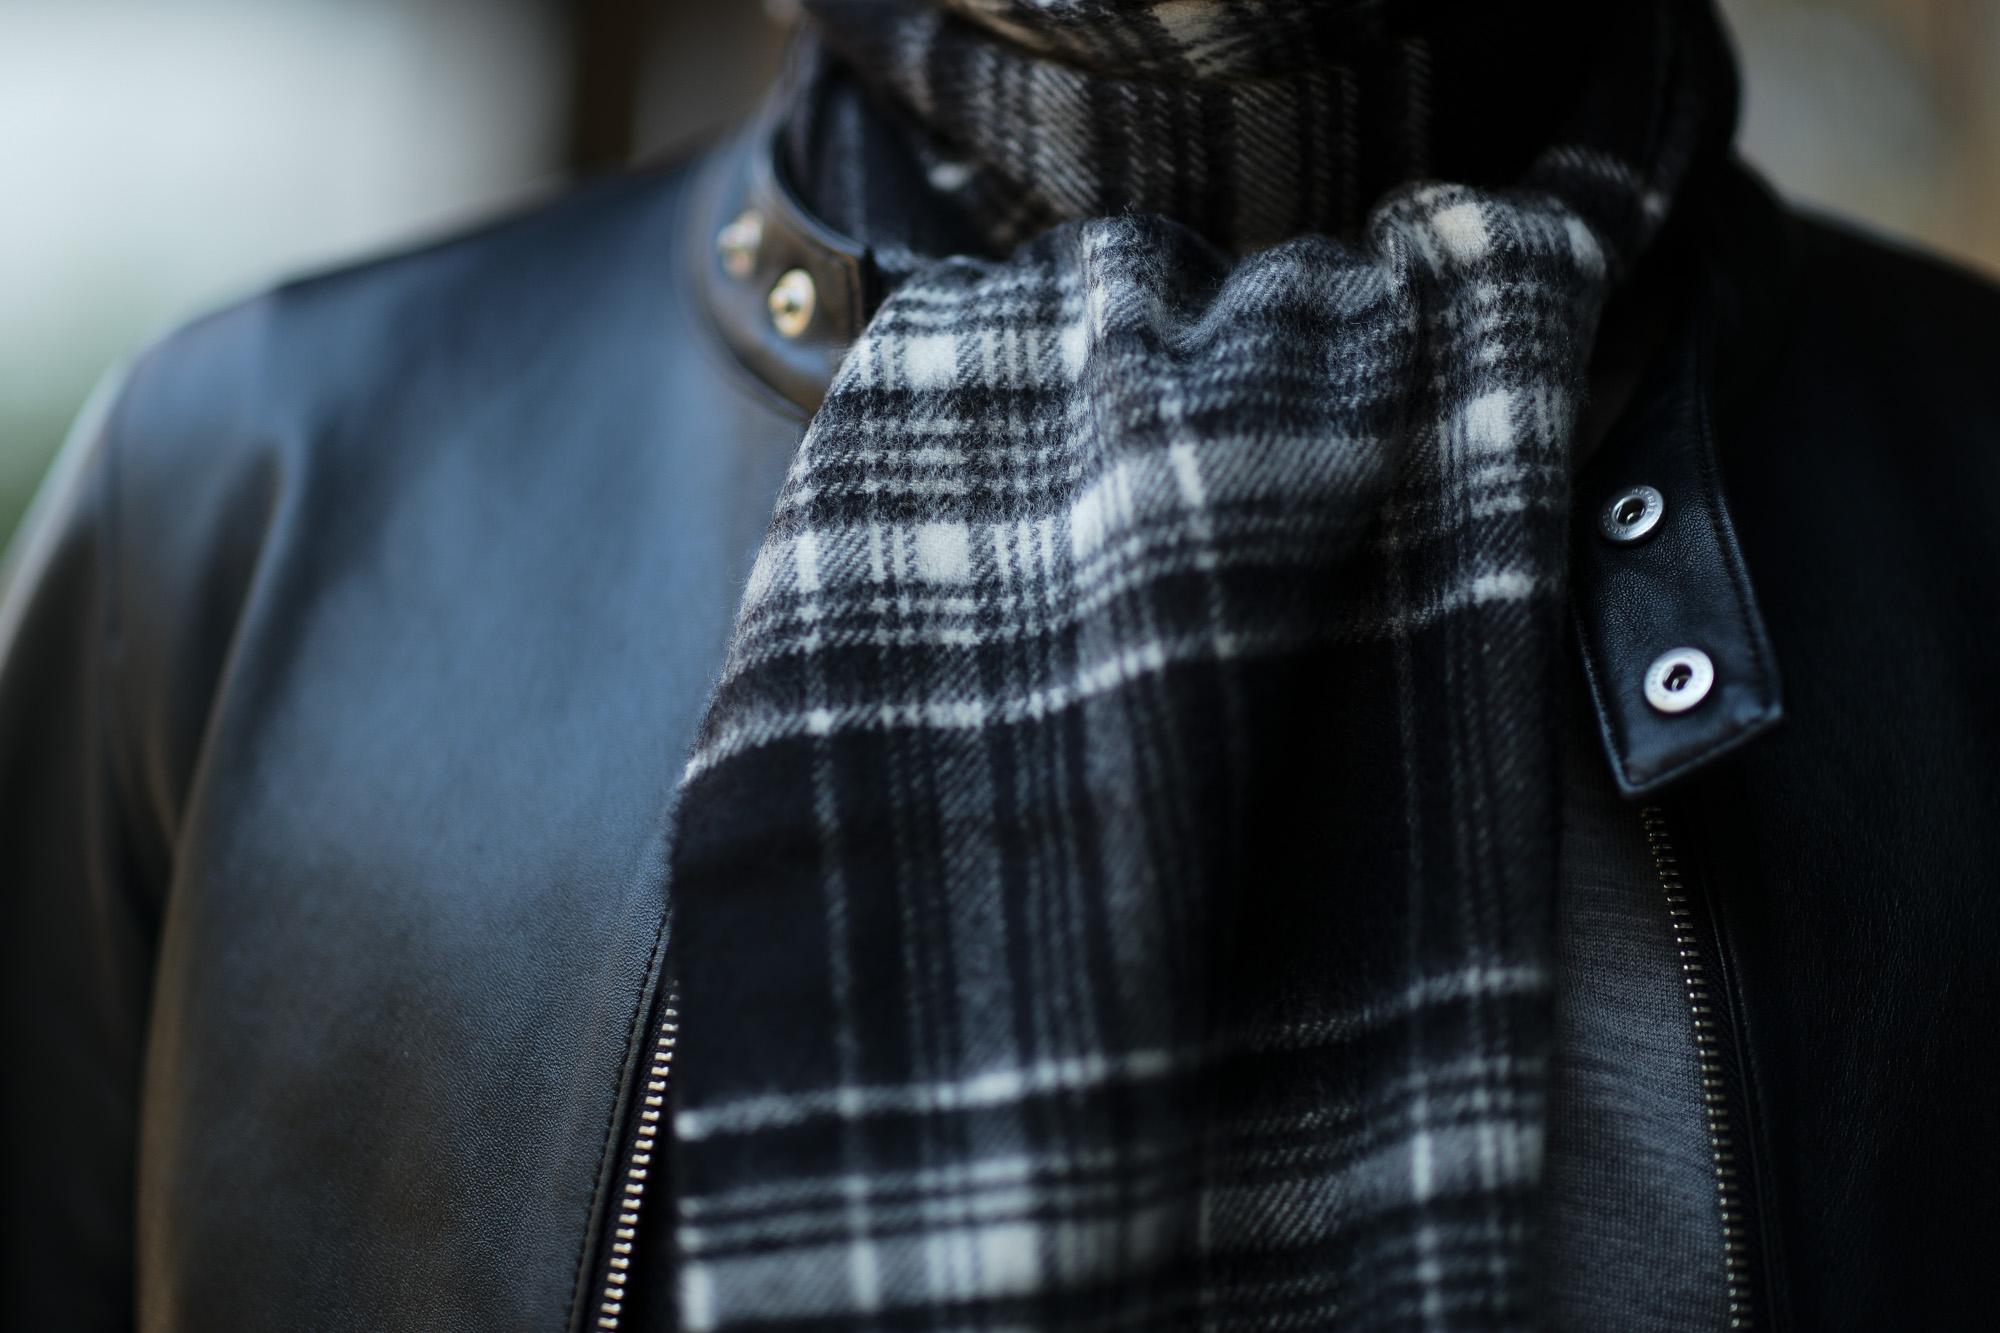 Johnstons (ジョンストンズ) WA16 MUFFLER SCARF Cashmere 100% カシミア マフラー Black & White Stewart (ブラック&ホワイトスチュアート・KU0079) Made in Scotland (スコットランド製) 2018 秋冬新作 愛知 名古屋 alto e diritto altoediritto アルトエデリット ストール ジョンストンズ